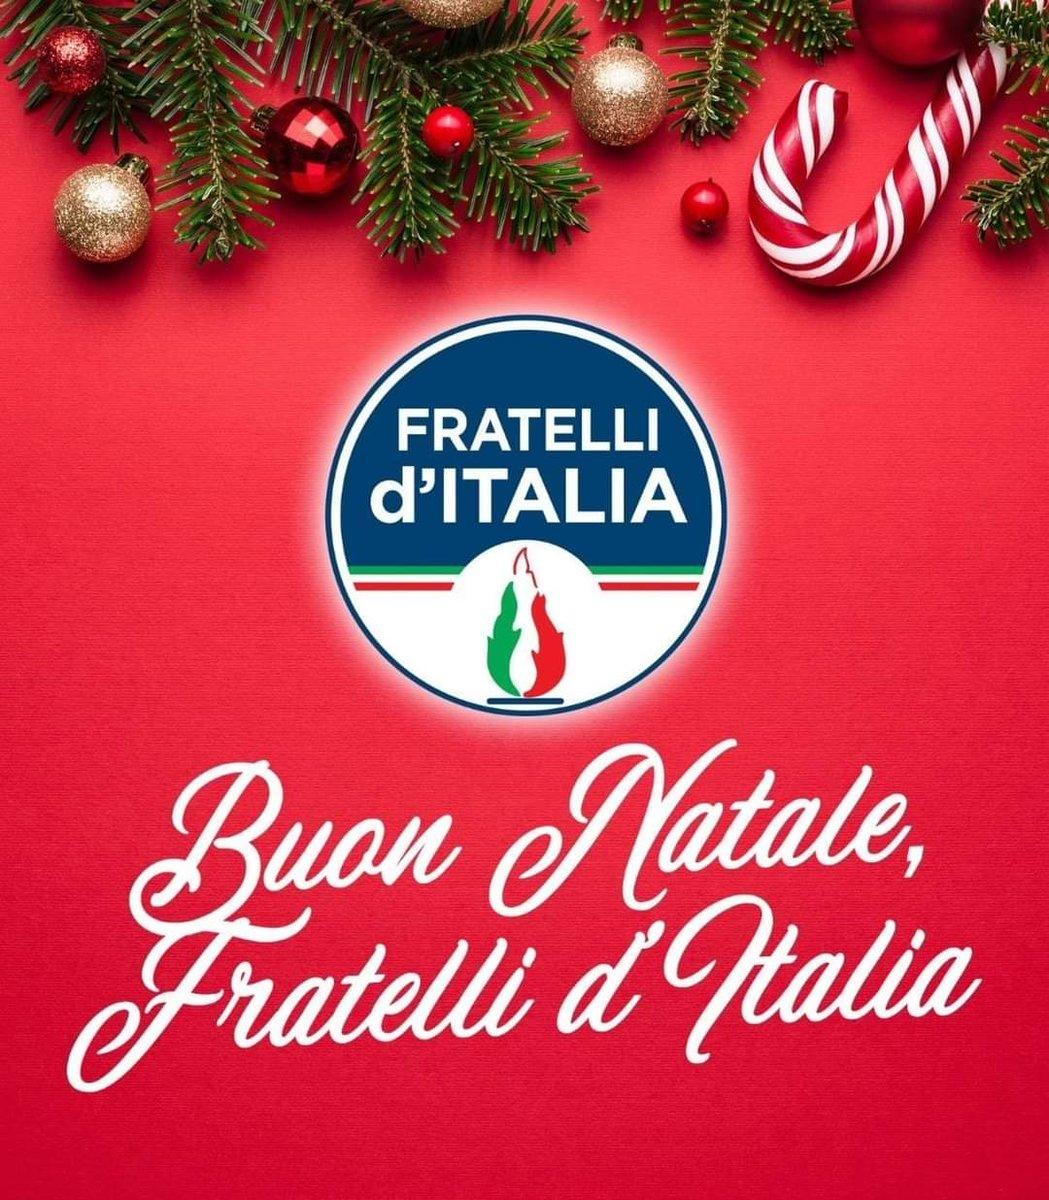 Buon Natale Italia.Fratelli D Italia On Twitter Auguri Di Buon Natale